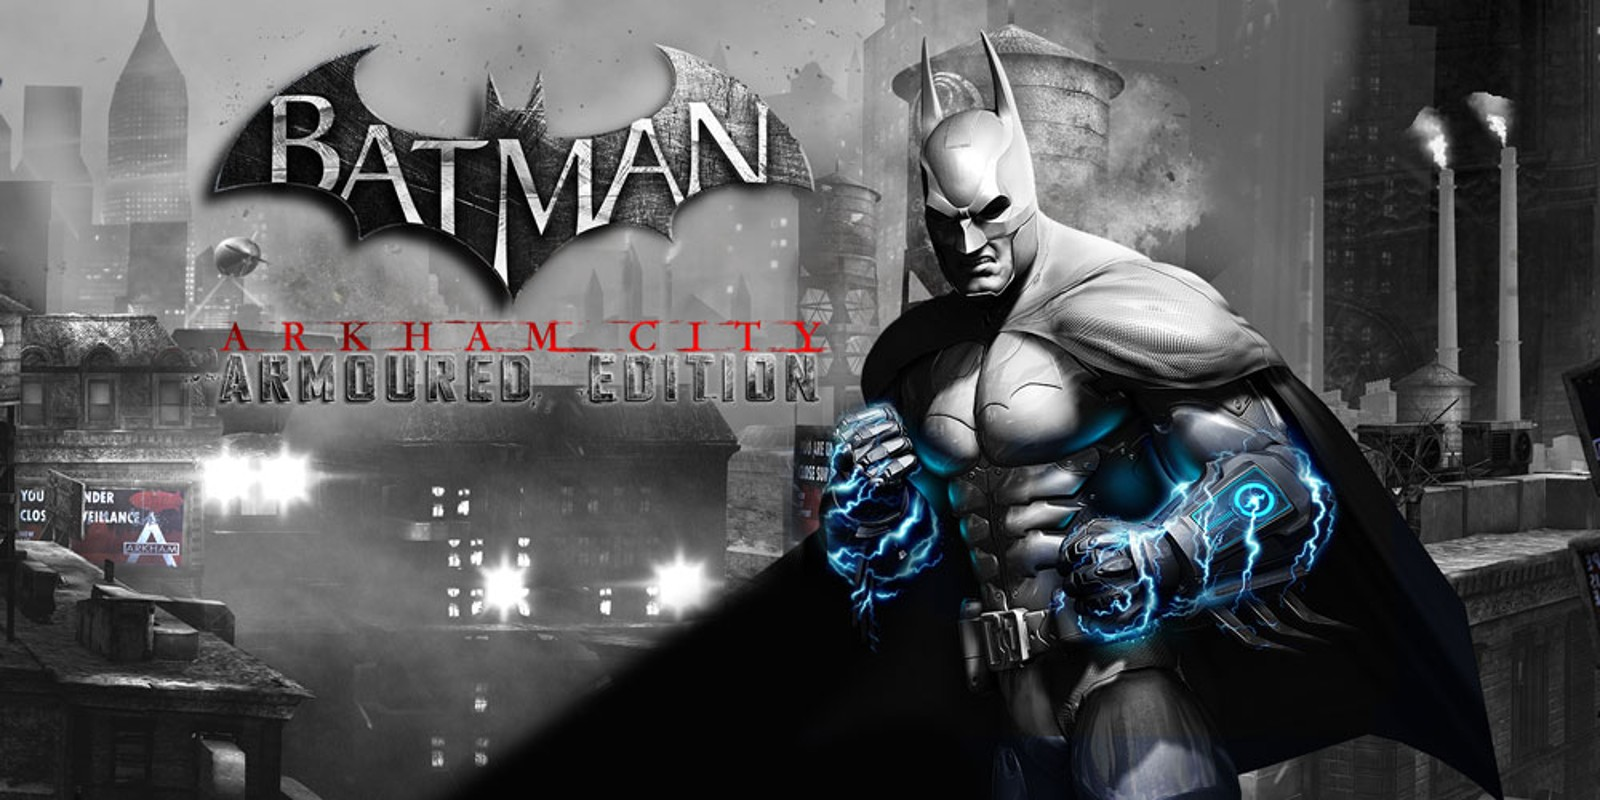 3d Action Wallpaper Hd Batman Arkham City Armoured Edition Wii U Games